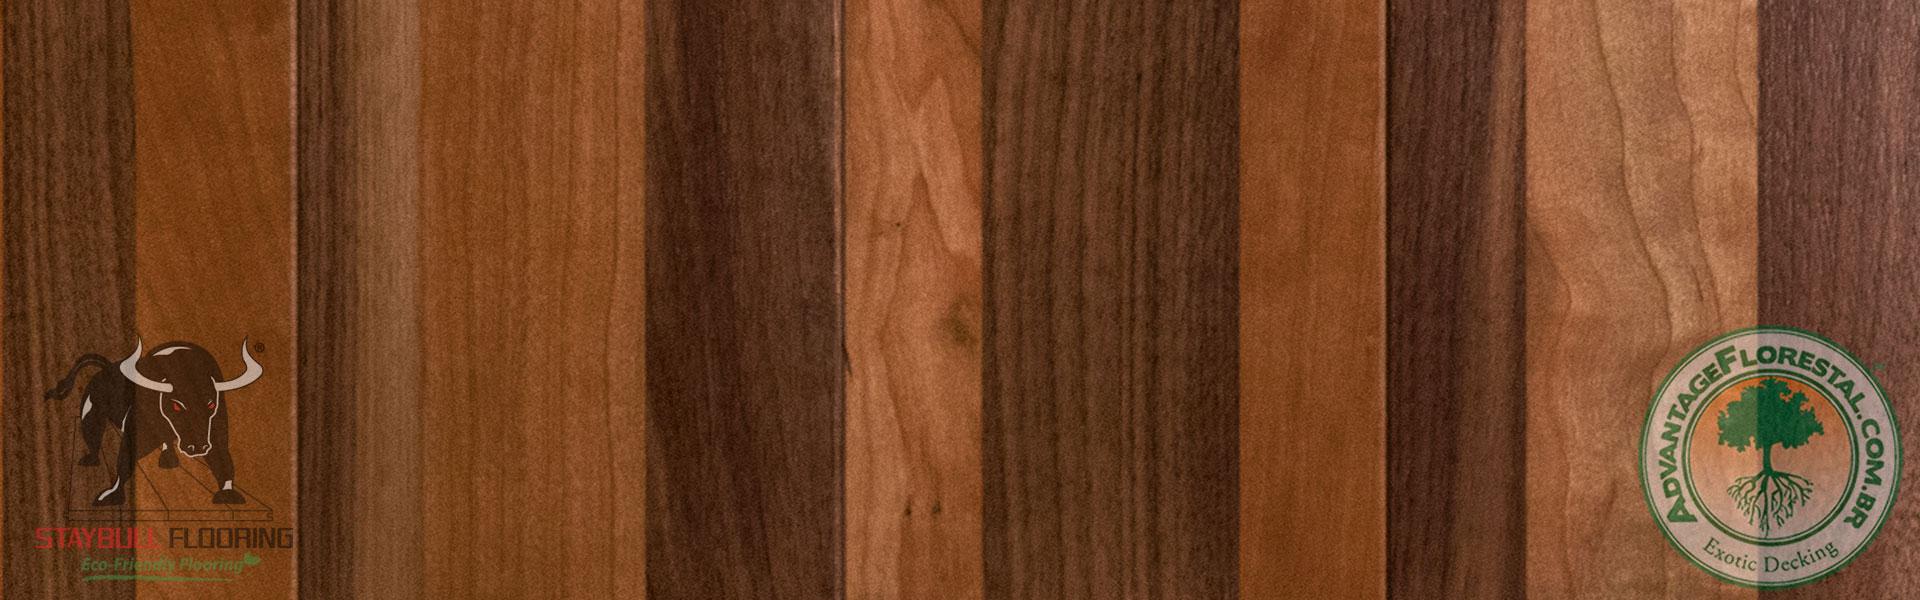 Wholesale Staybull Cherry Walnut Hardwood Flooring